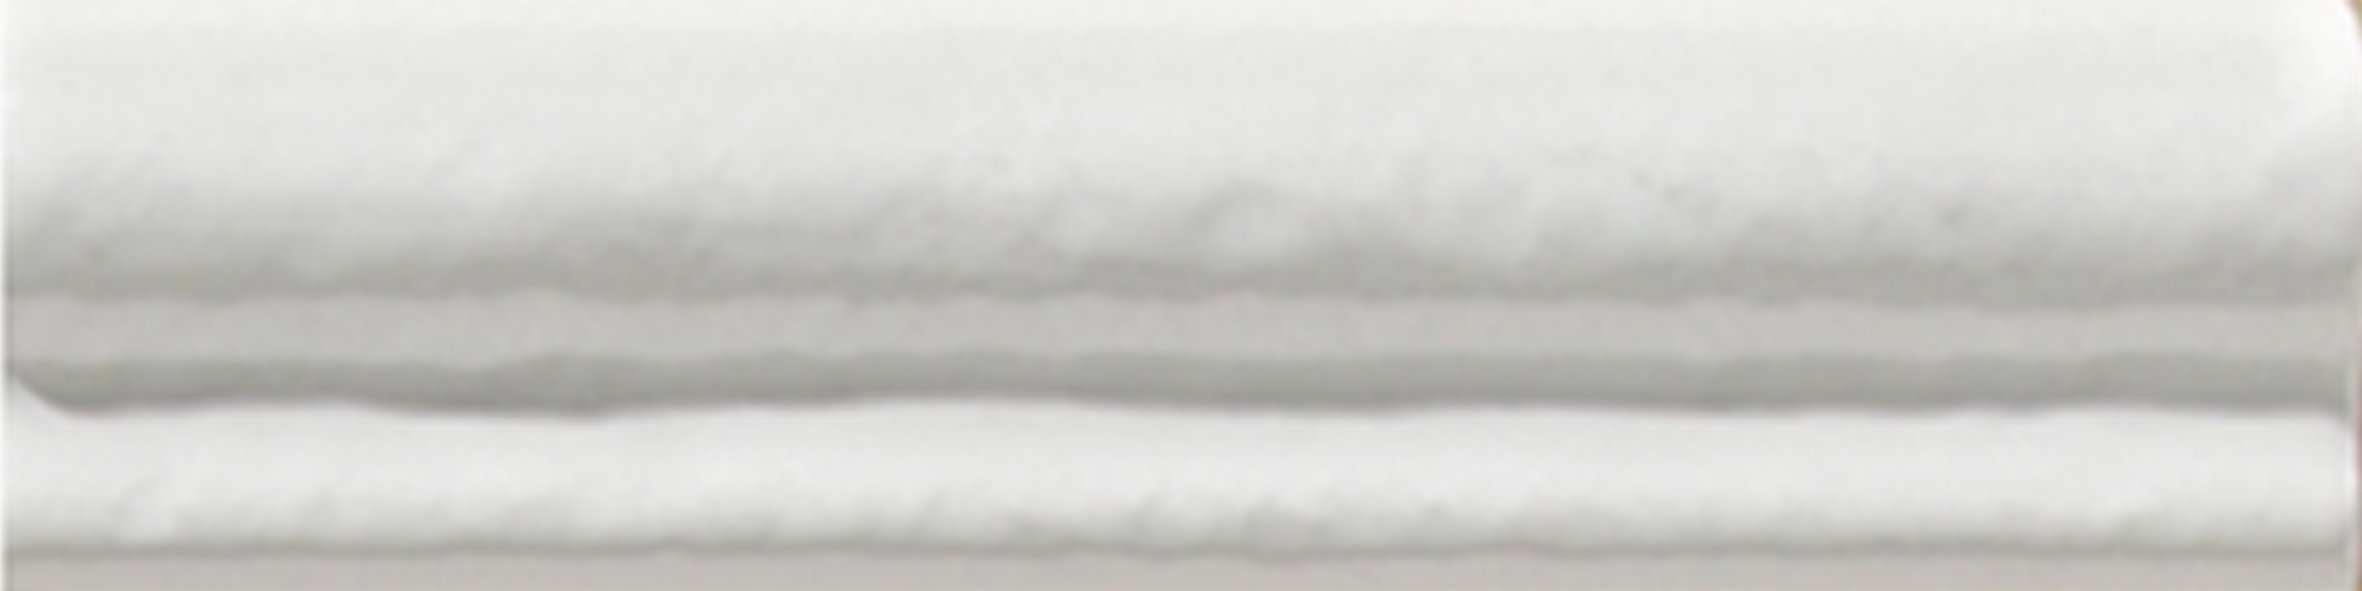 JÄÄK Porte Moldura Reflet Blanco 5x20 - Hansas Plaadimaailm